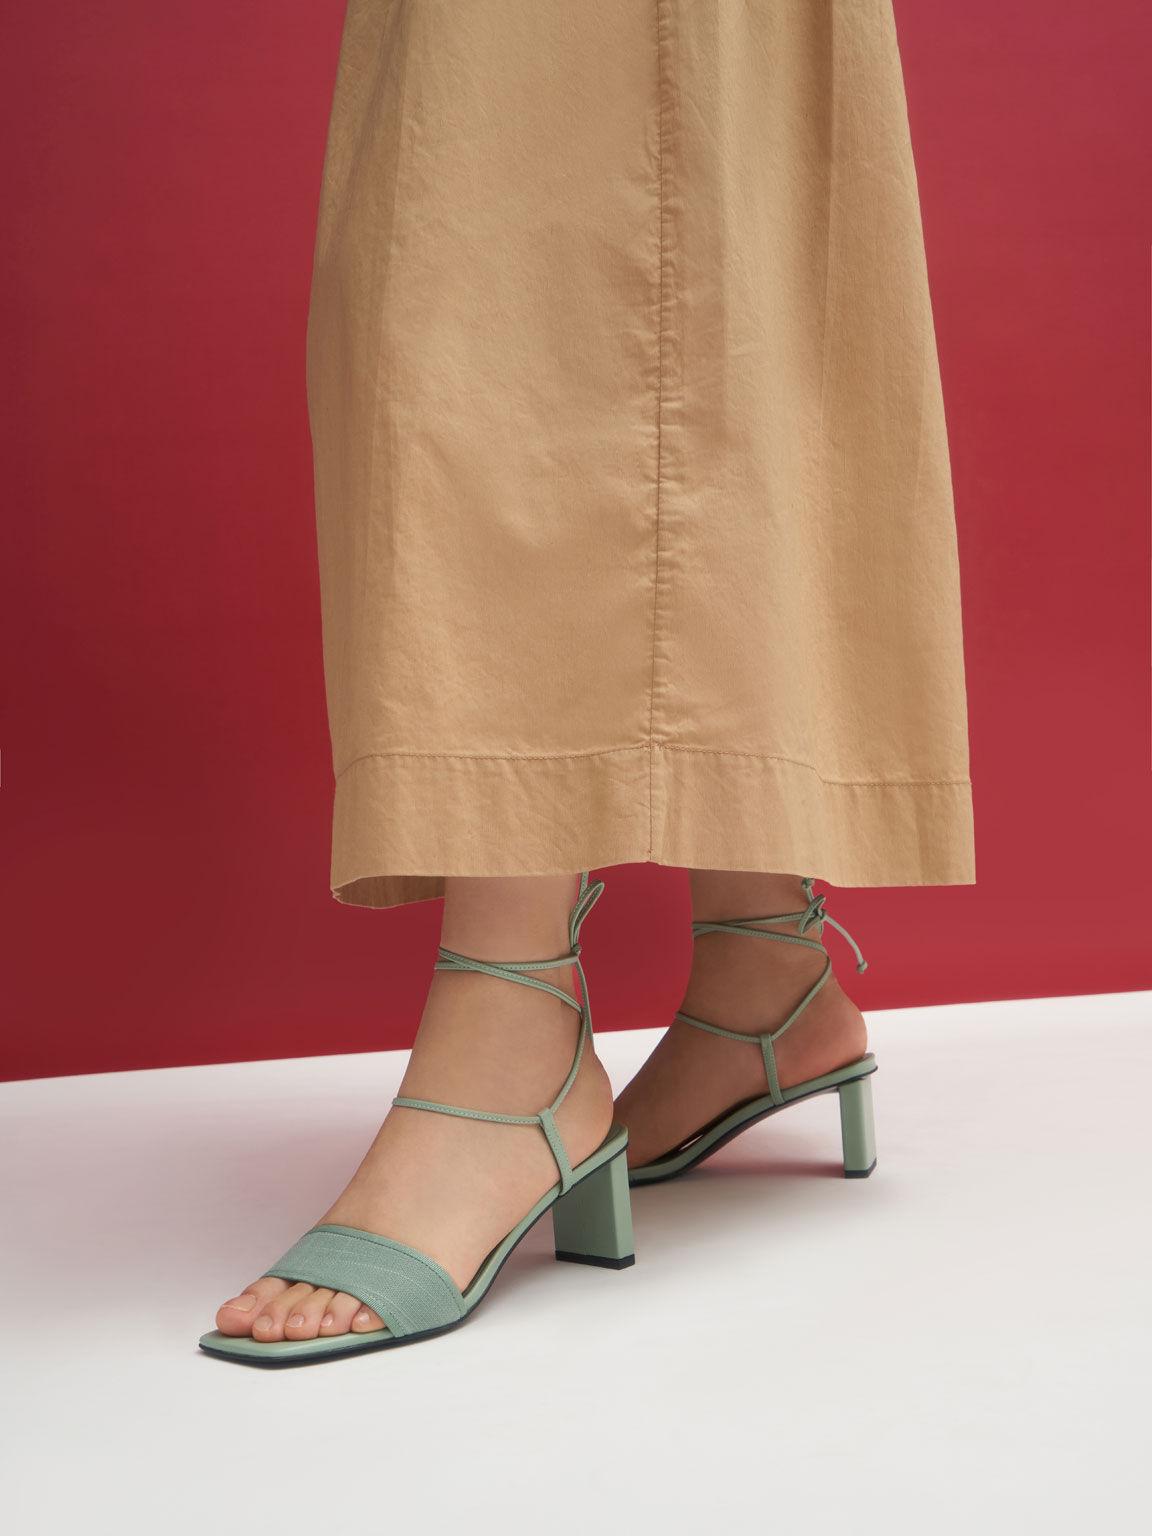 Linen Tie-Around Sandals, Sage Green, hi-res